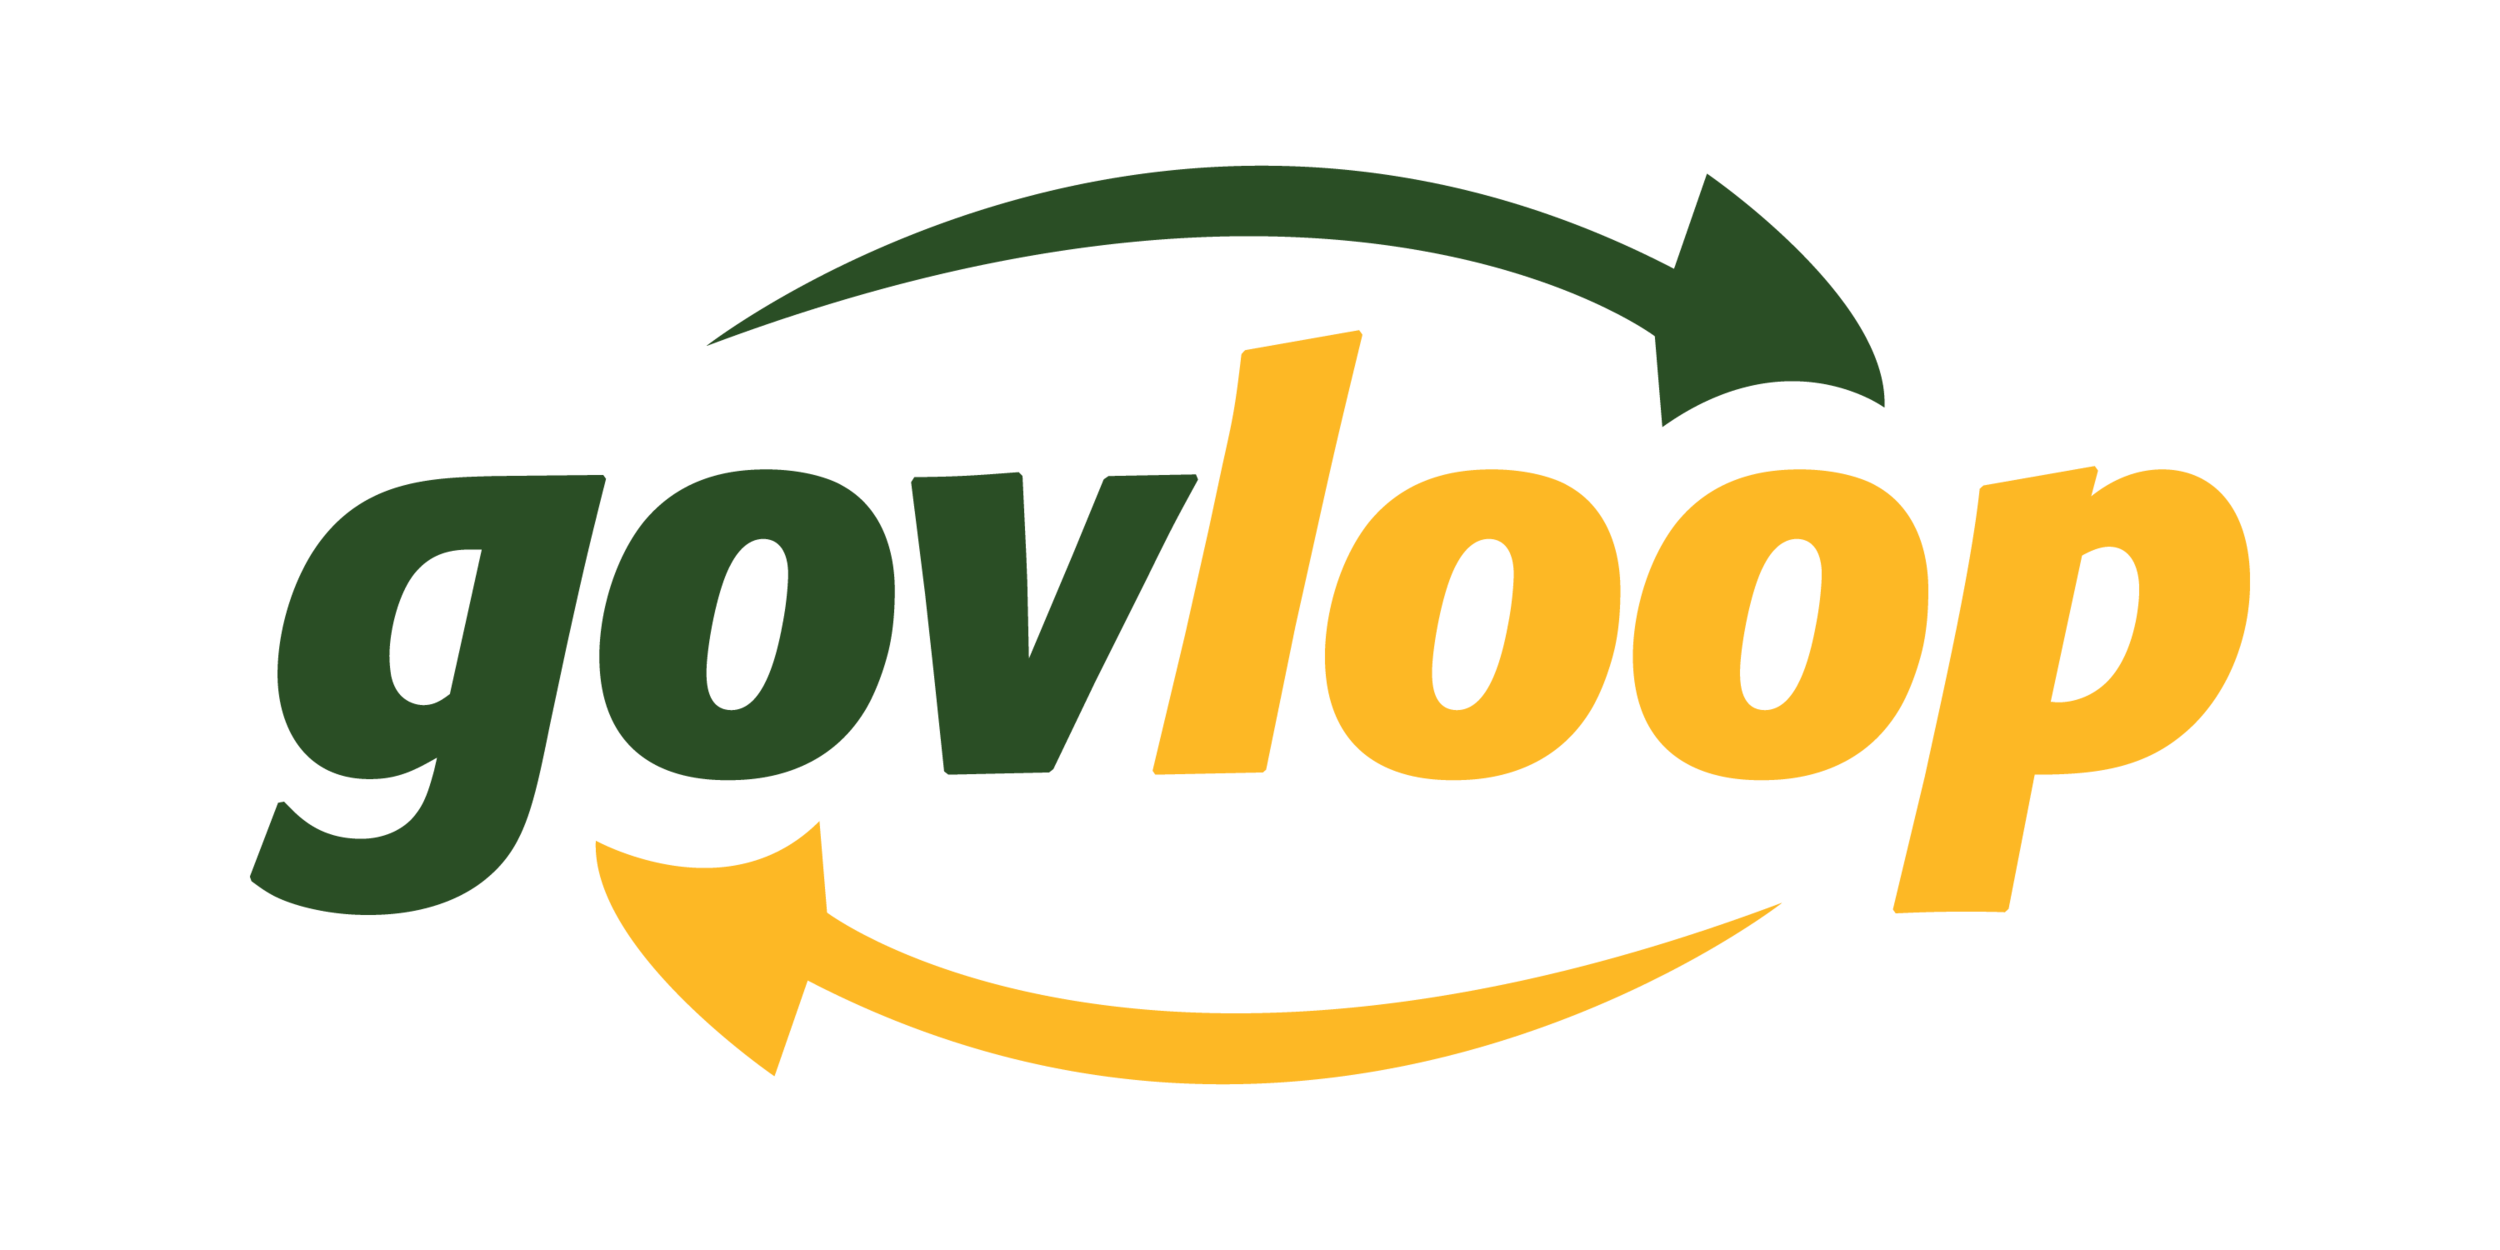 Logo_GovLoop_hires.png